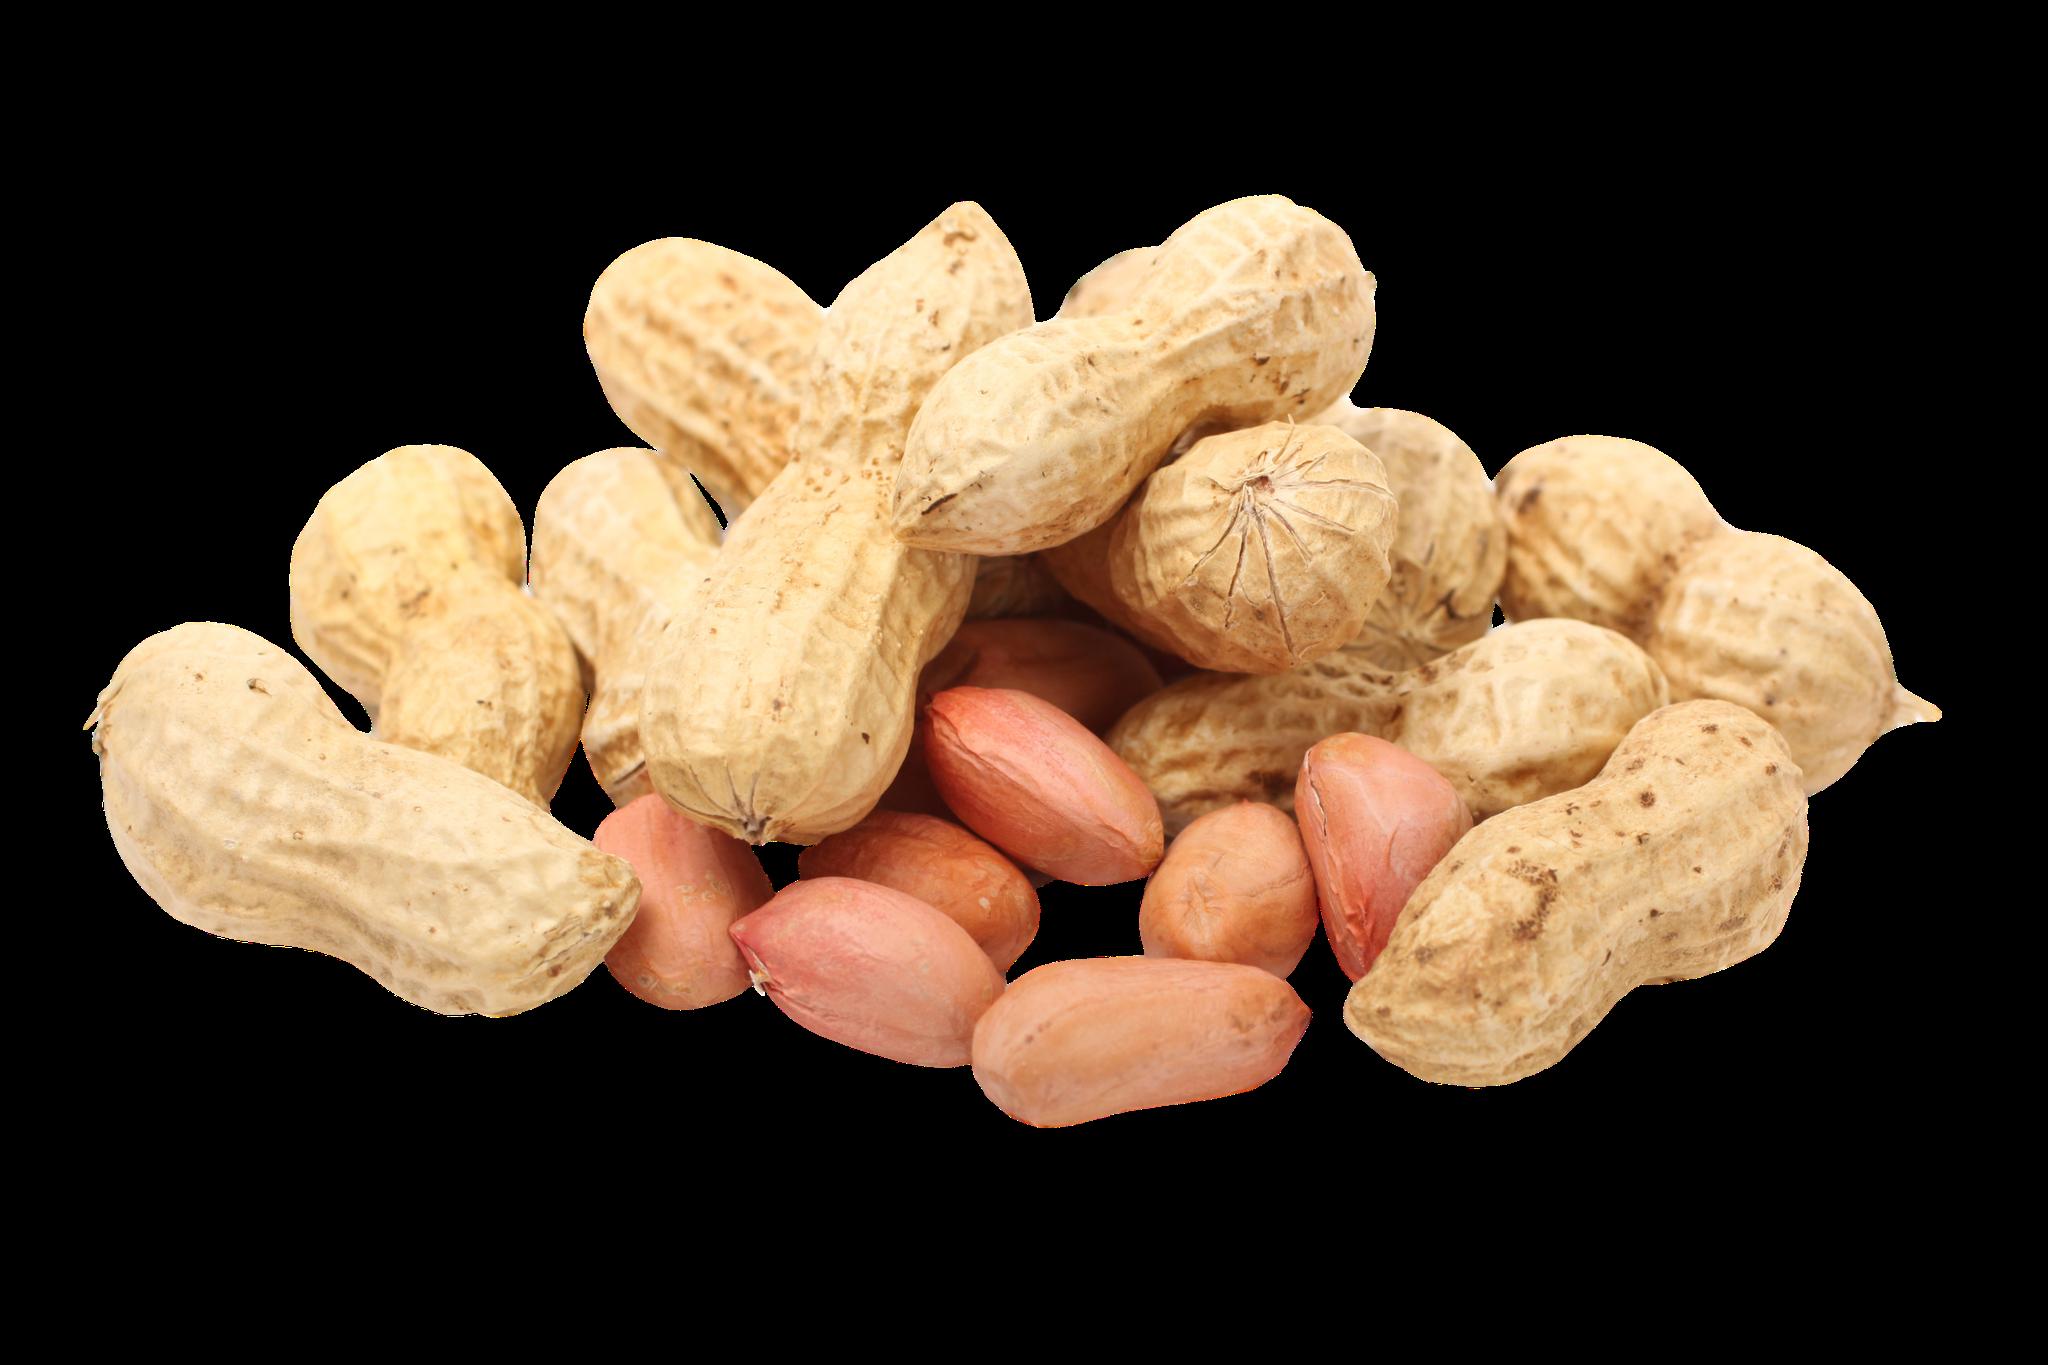 Carolina Black Peanut, 28 g : Southern Exposure Seed